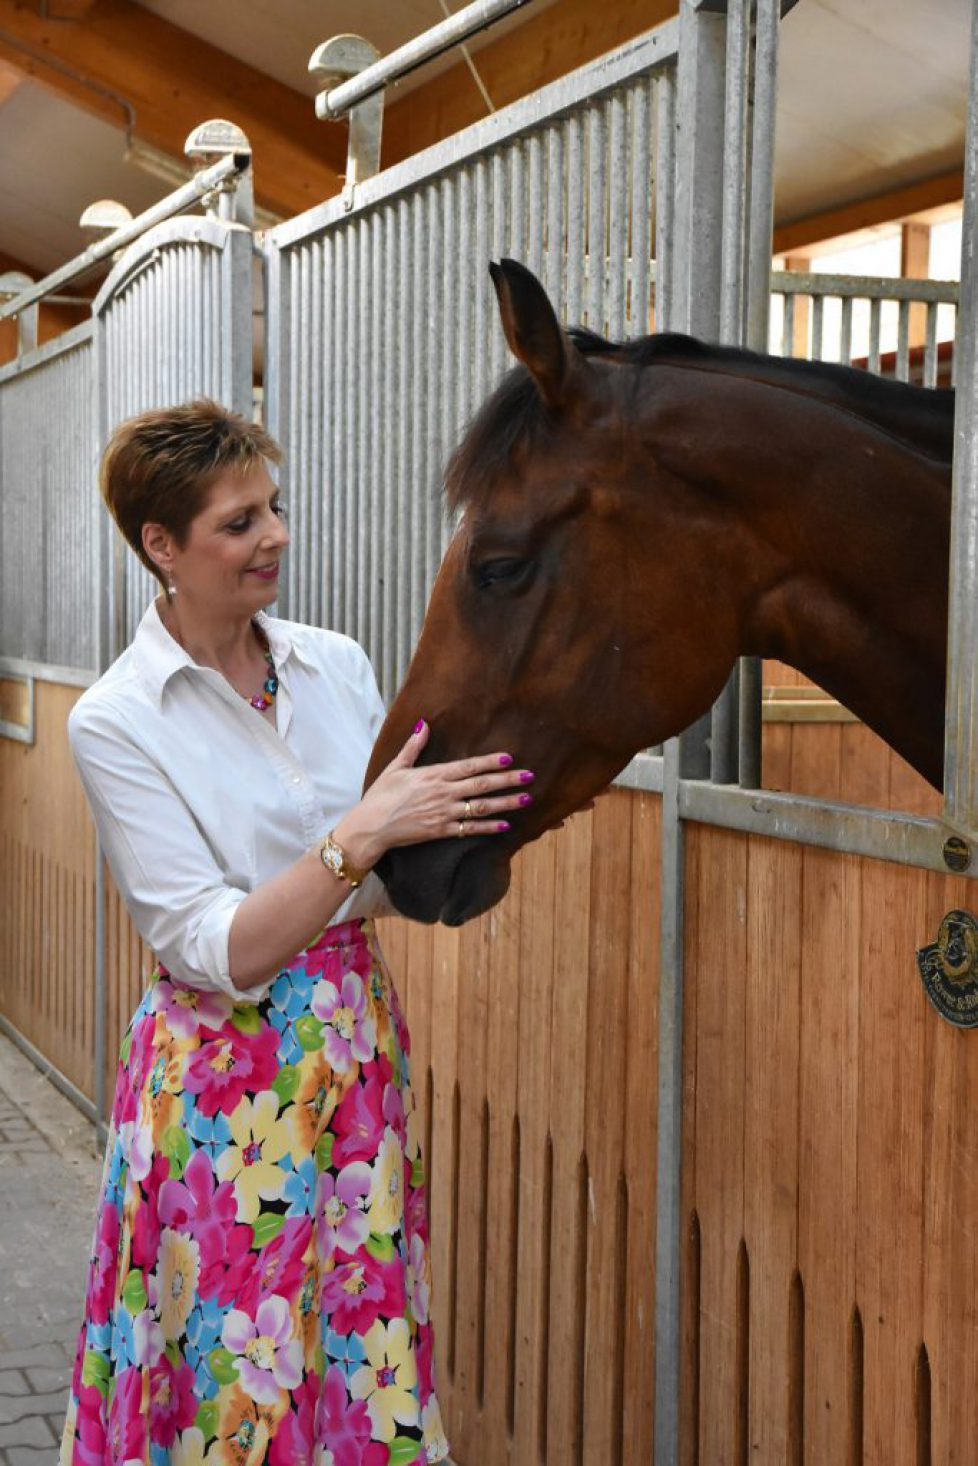 Principesa-Maria-Concursul-de-echitatie-Jockey-Club-Grand-Prix-Equestria-Tancabesti-22-iulie-2017-1